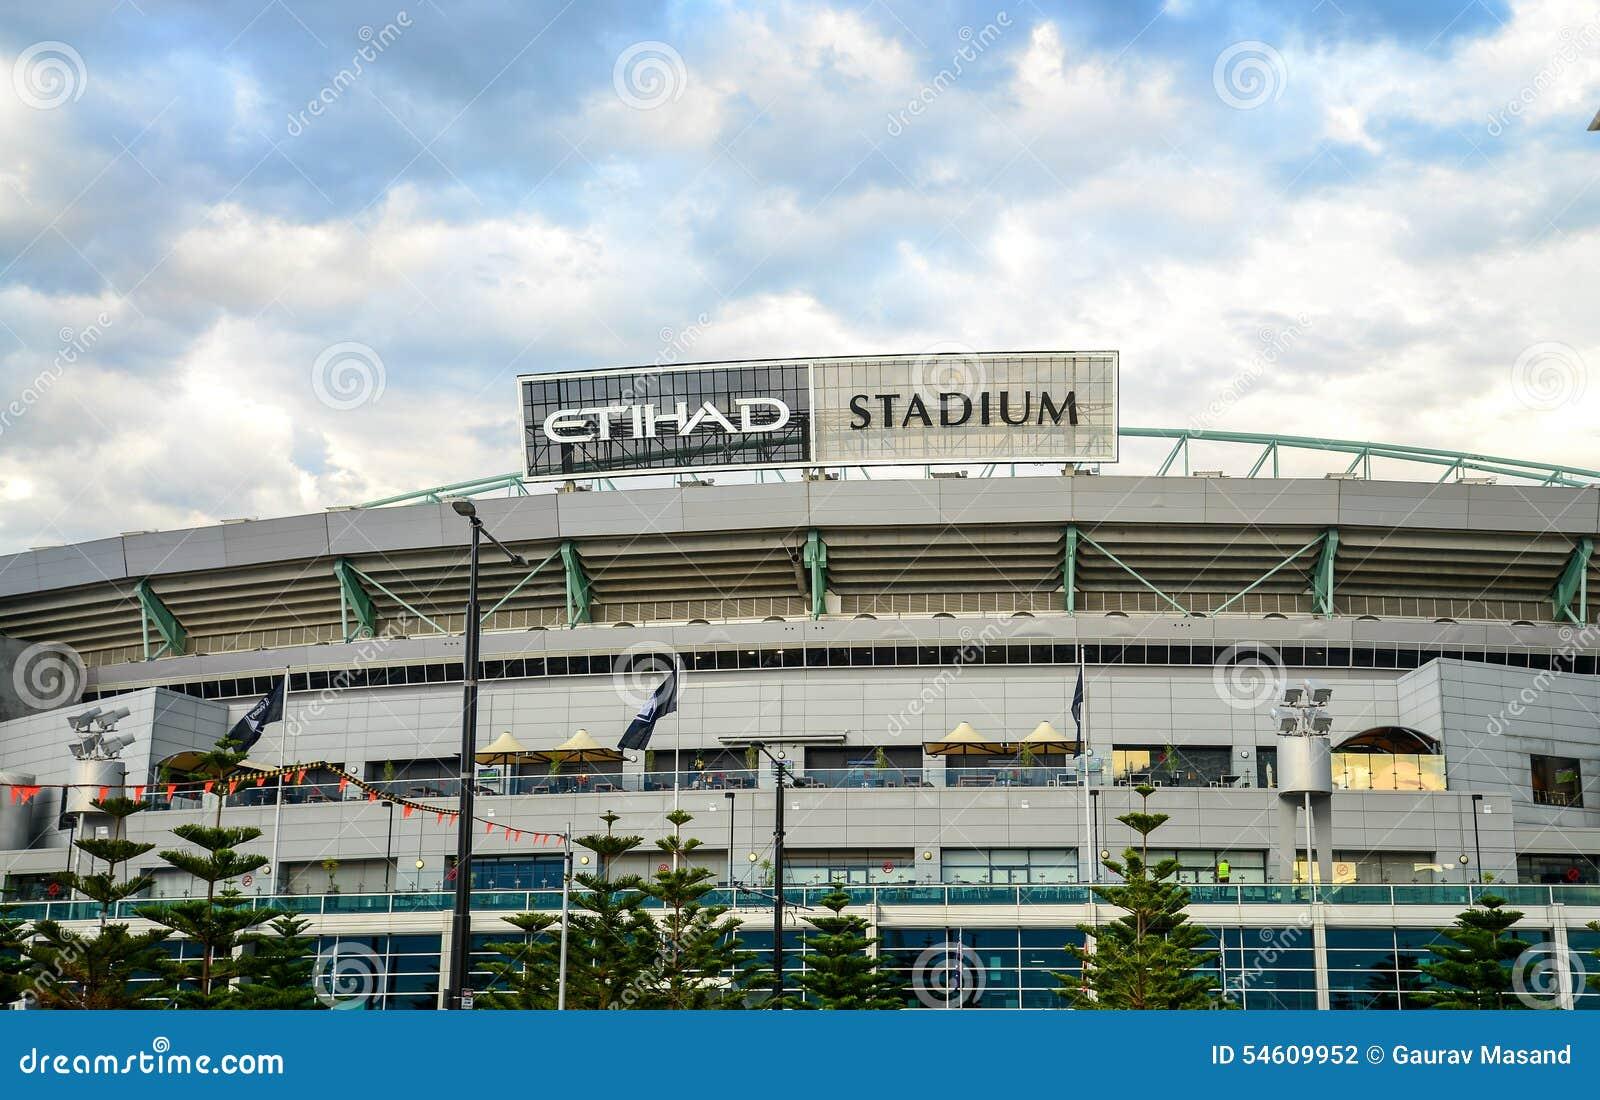 Etihad stadium melbourne editorial photography. Image of australia -  54609952